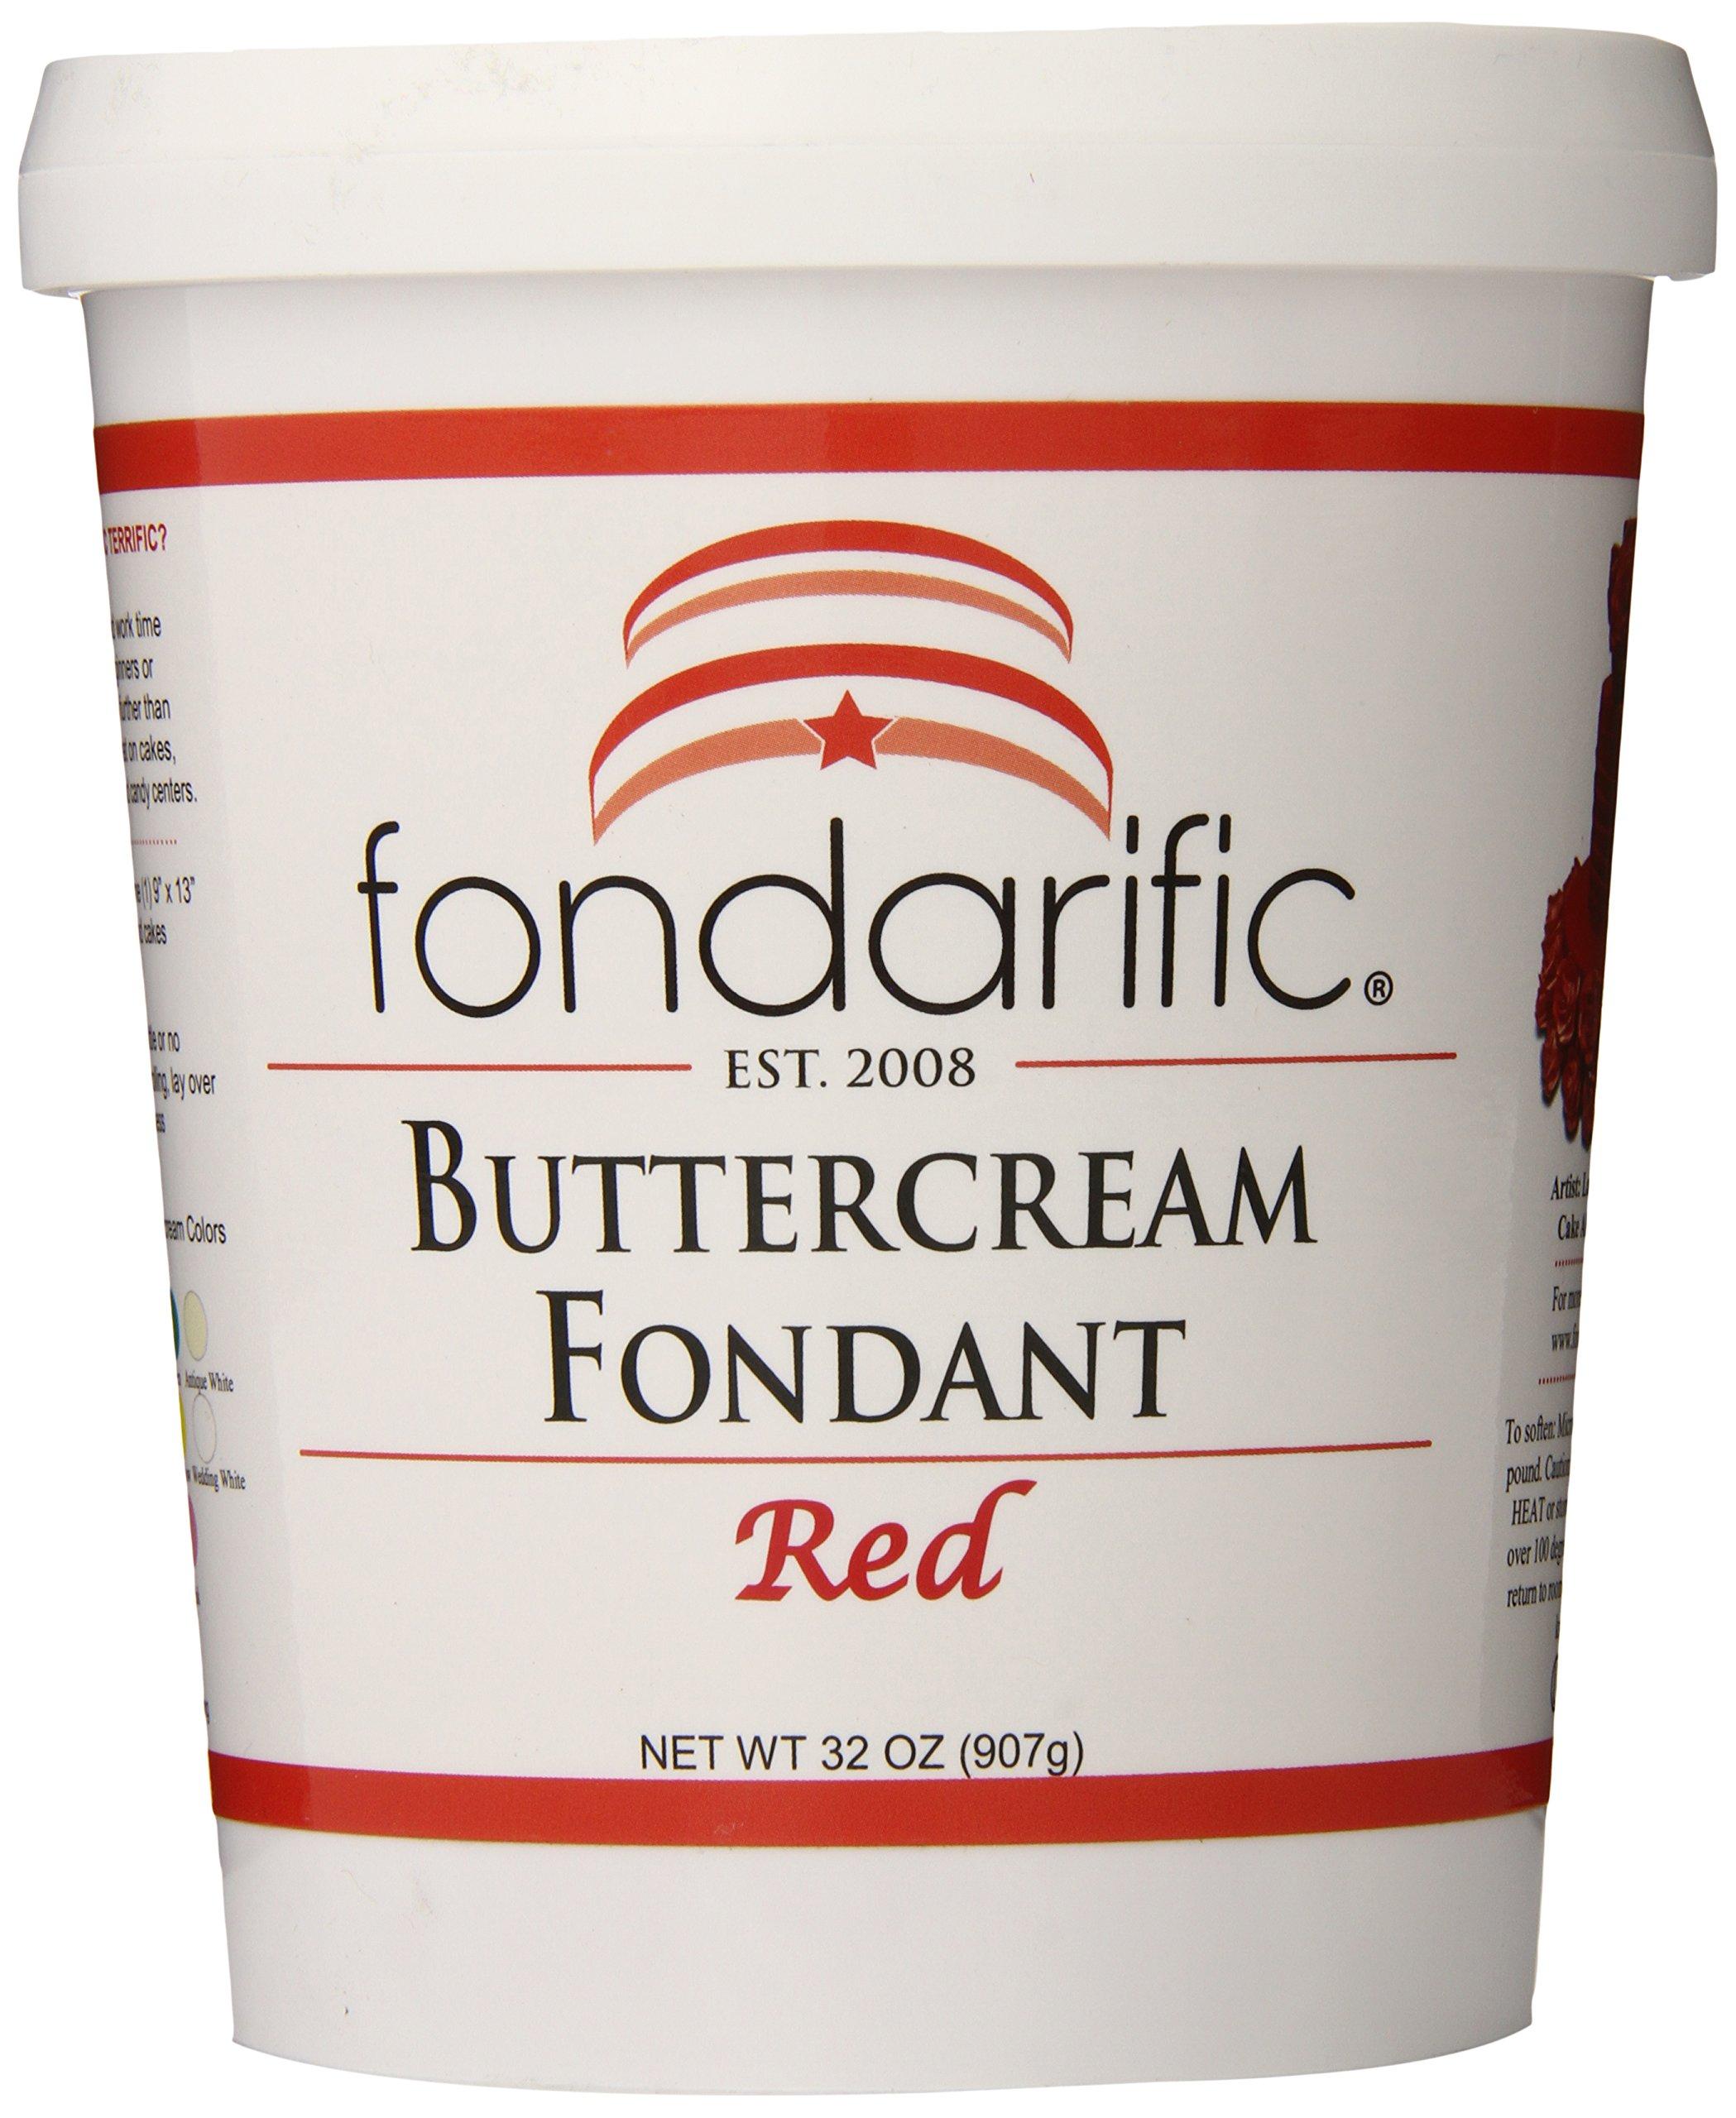 Fondarific Buttercream Red Fondant, 2-Pounds by Fondarific